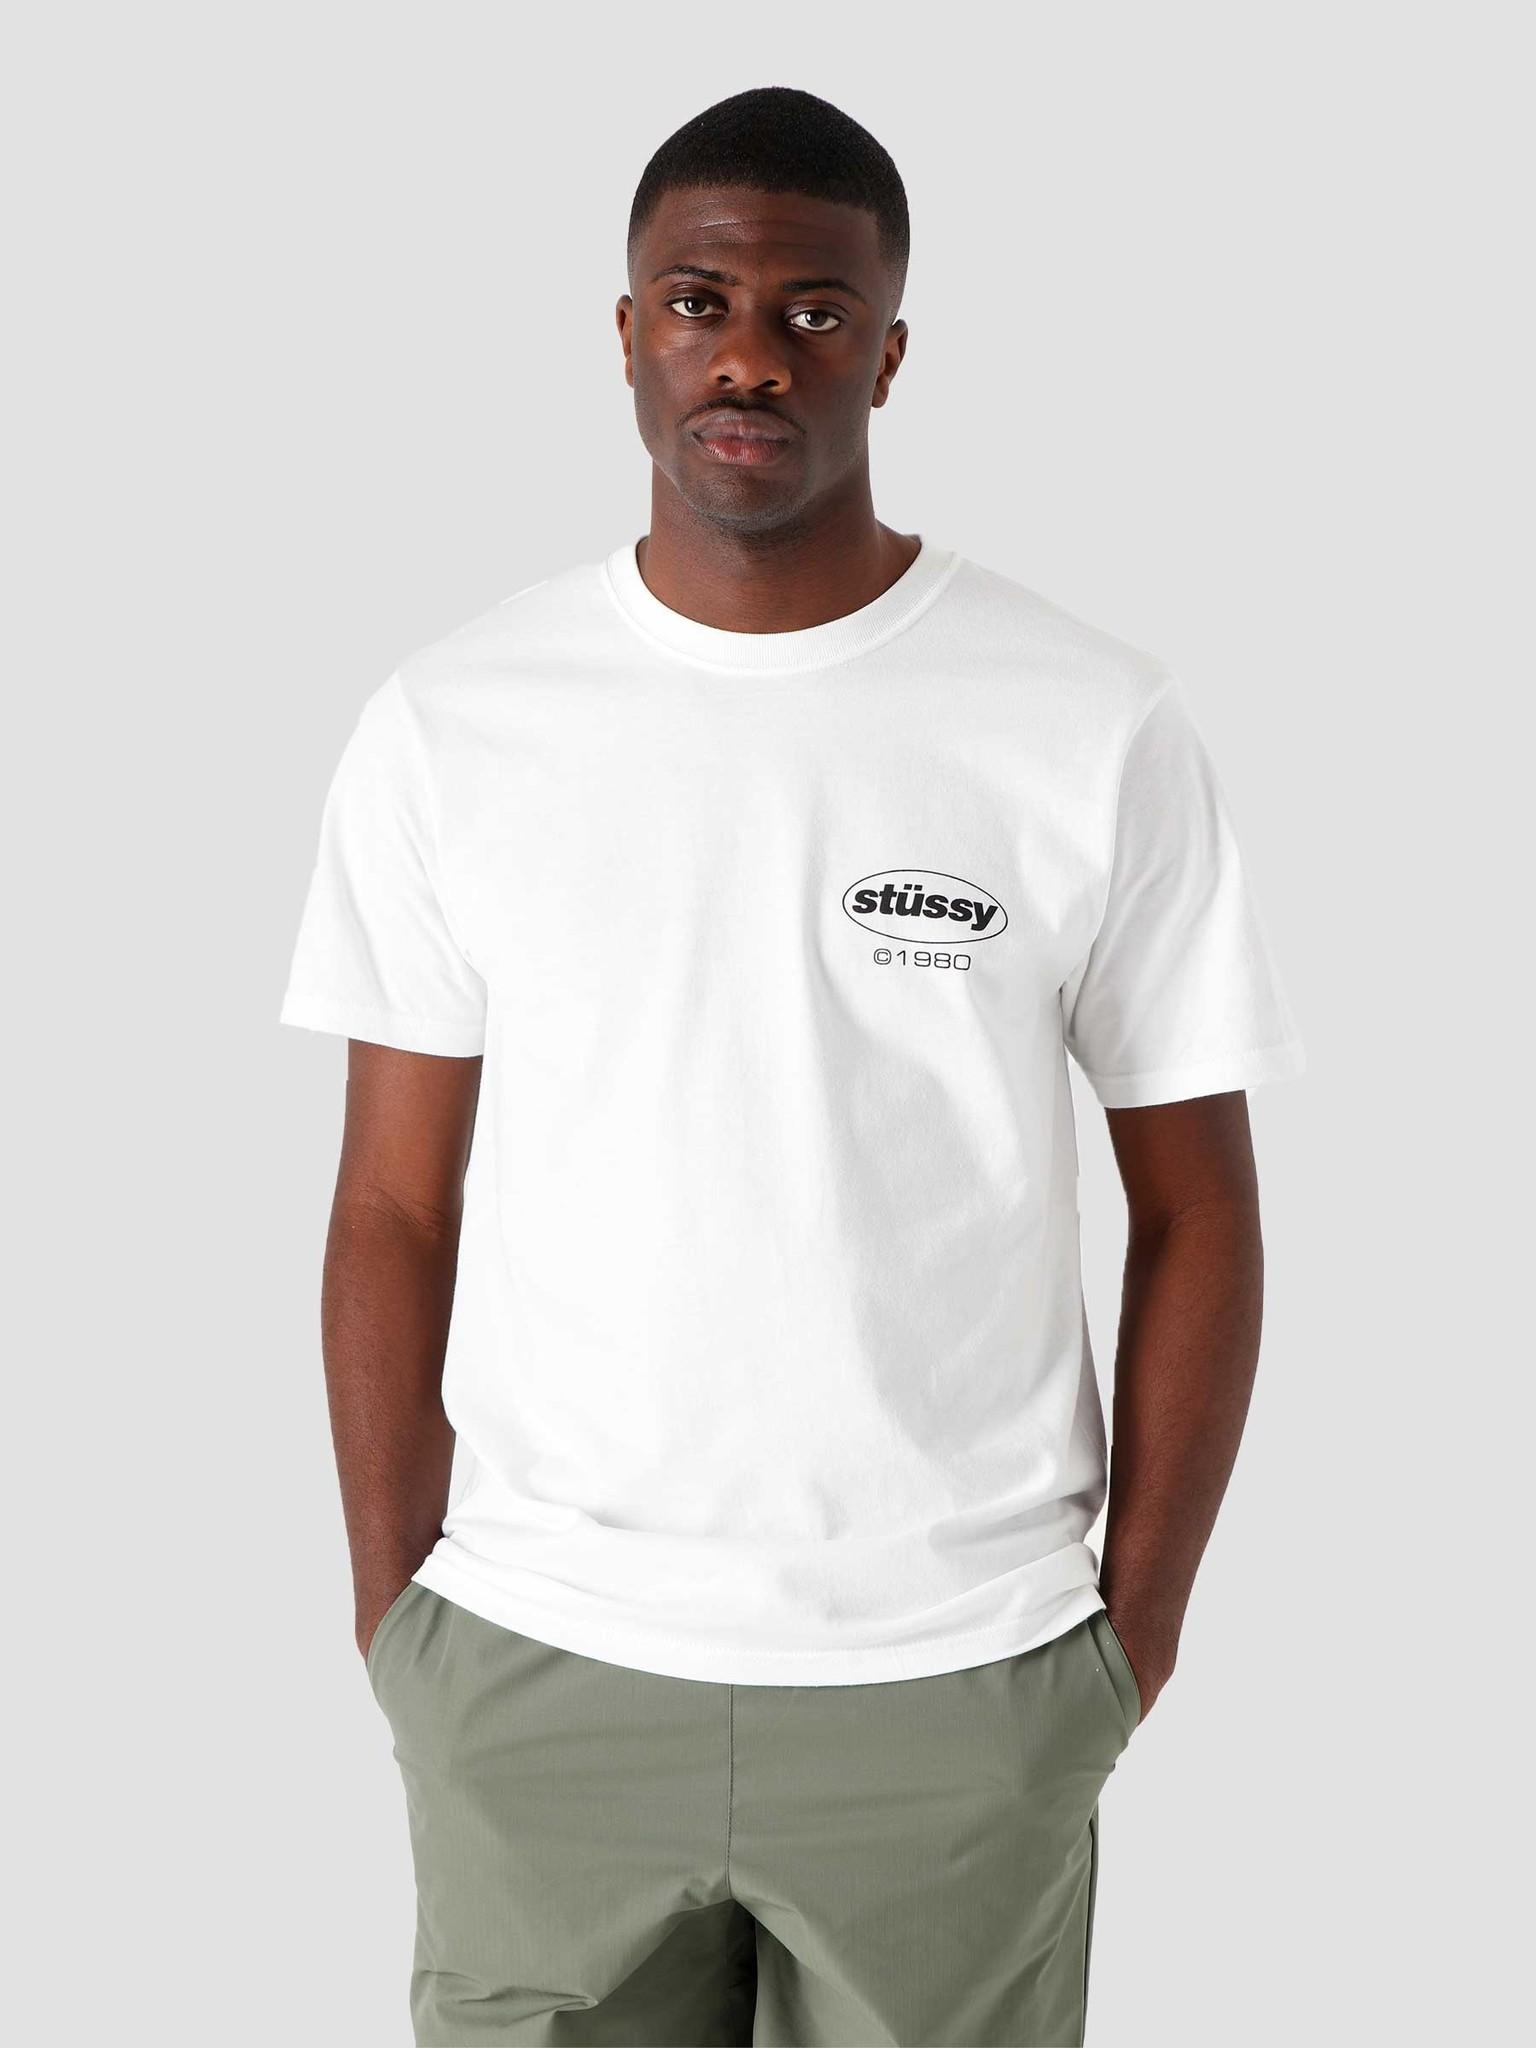 Stussy Stussy Soul T-Shirt White 1904669-1201